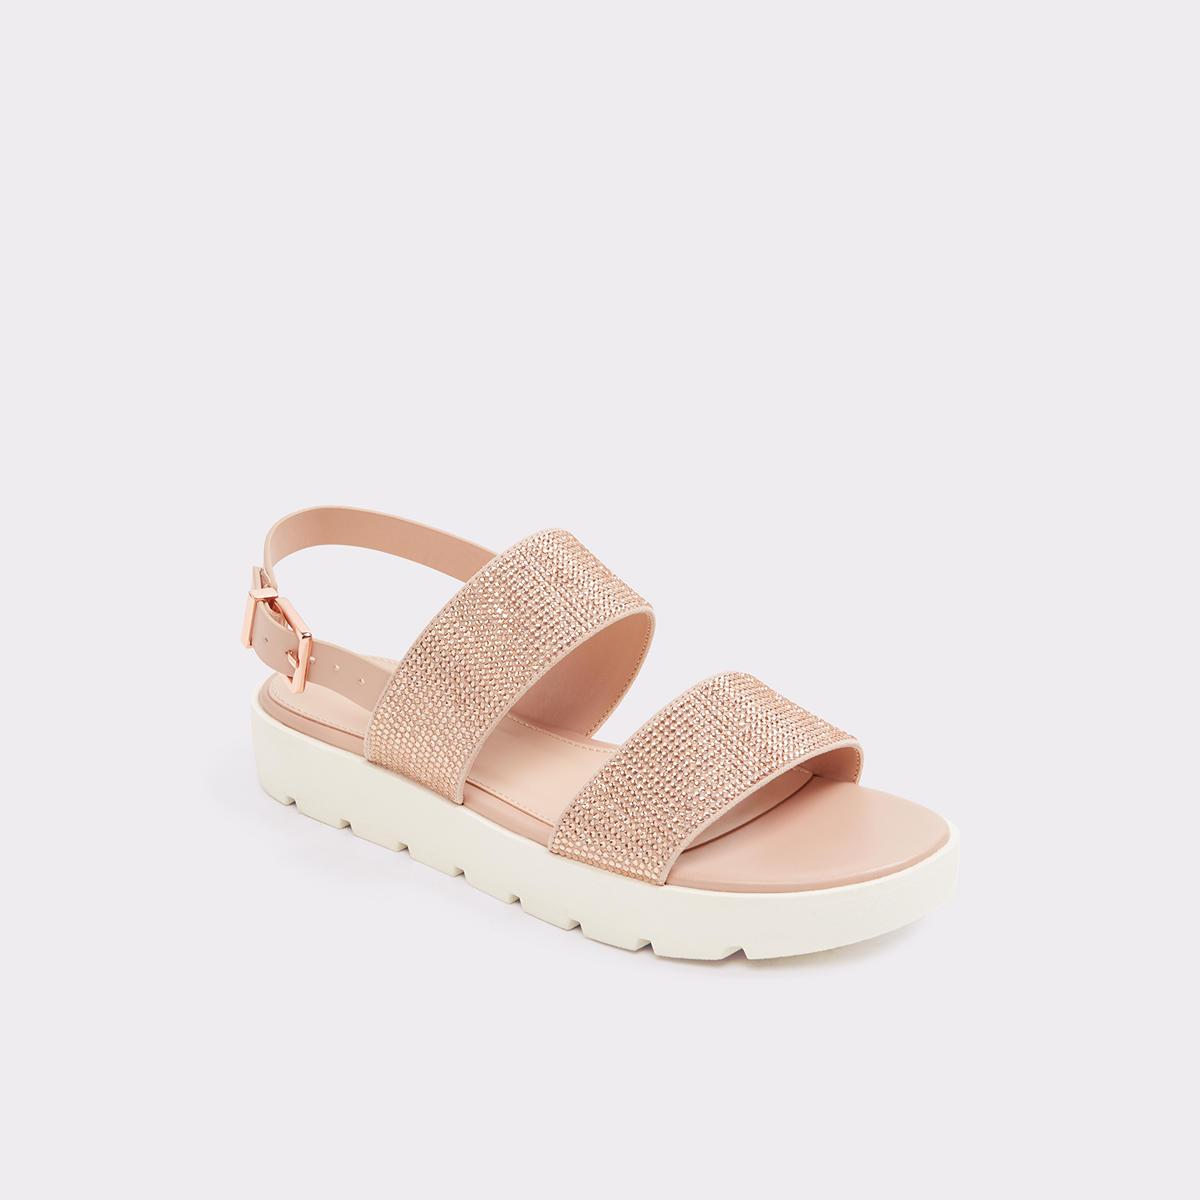 Eliraviel Metallic Rhinestone Flatform Sandals 4XOdA